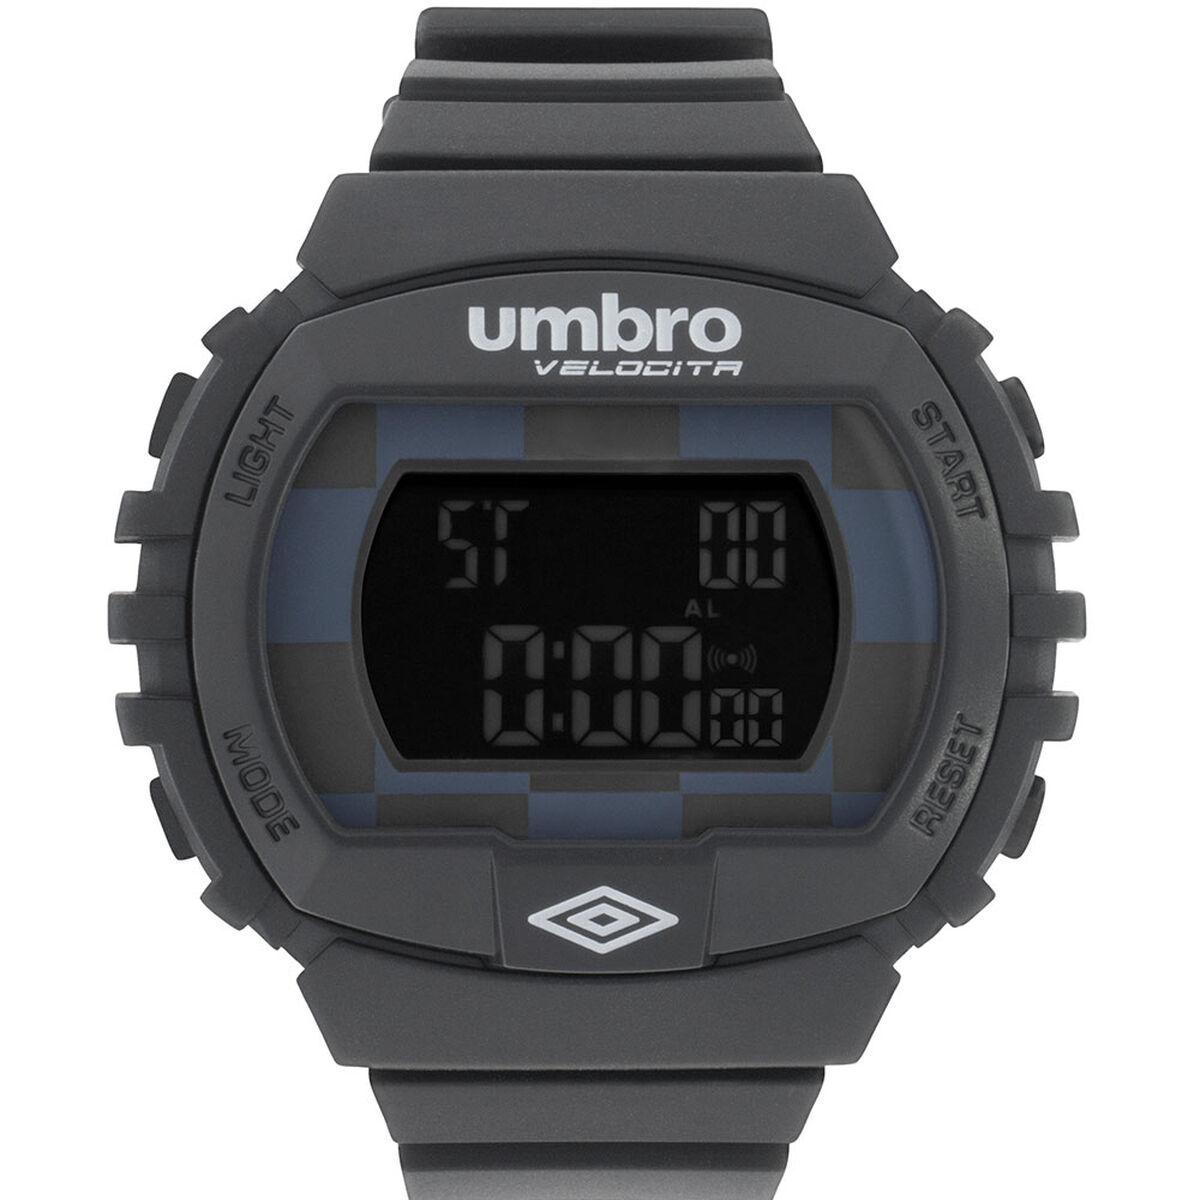 Reloj Digital Umbro UMB-067-2